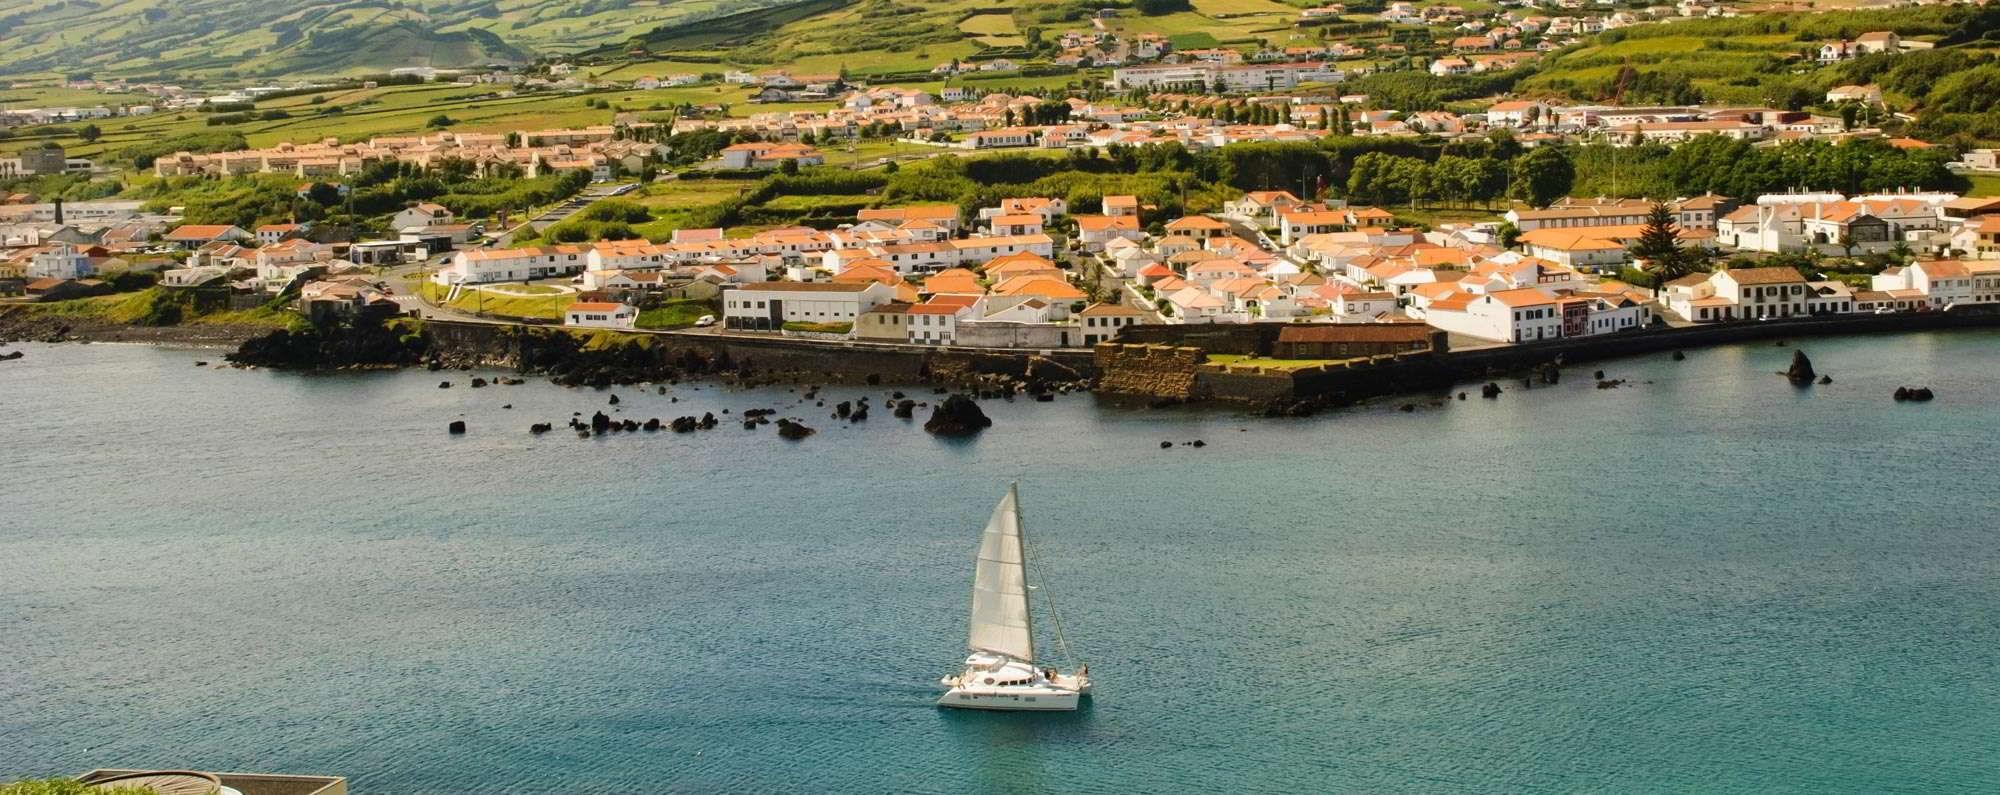 Yachtcharter Azoren